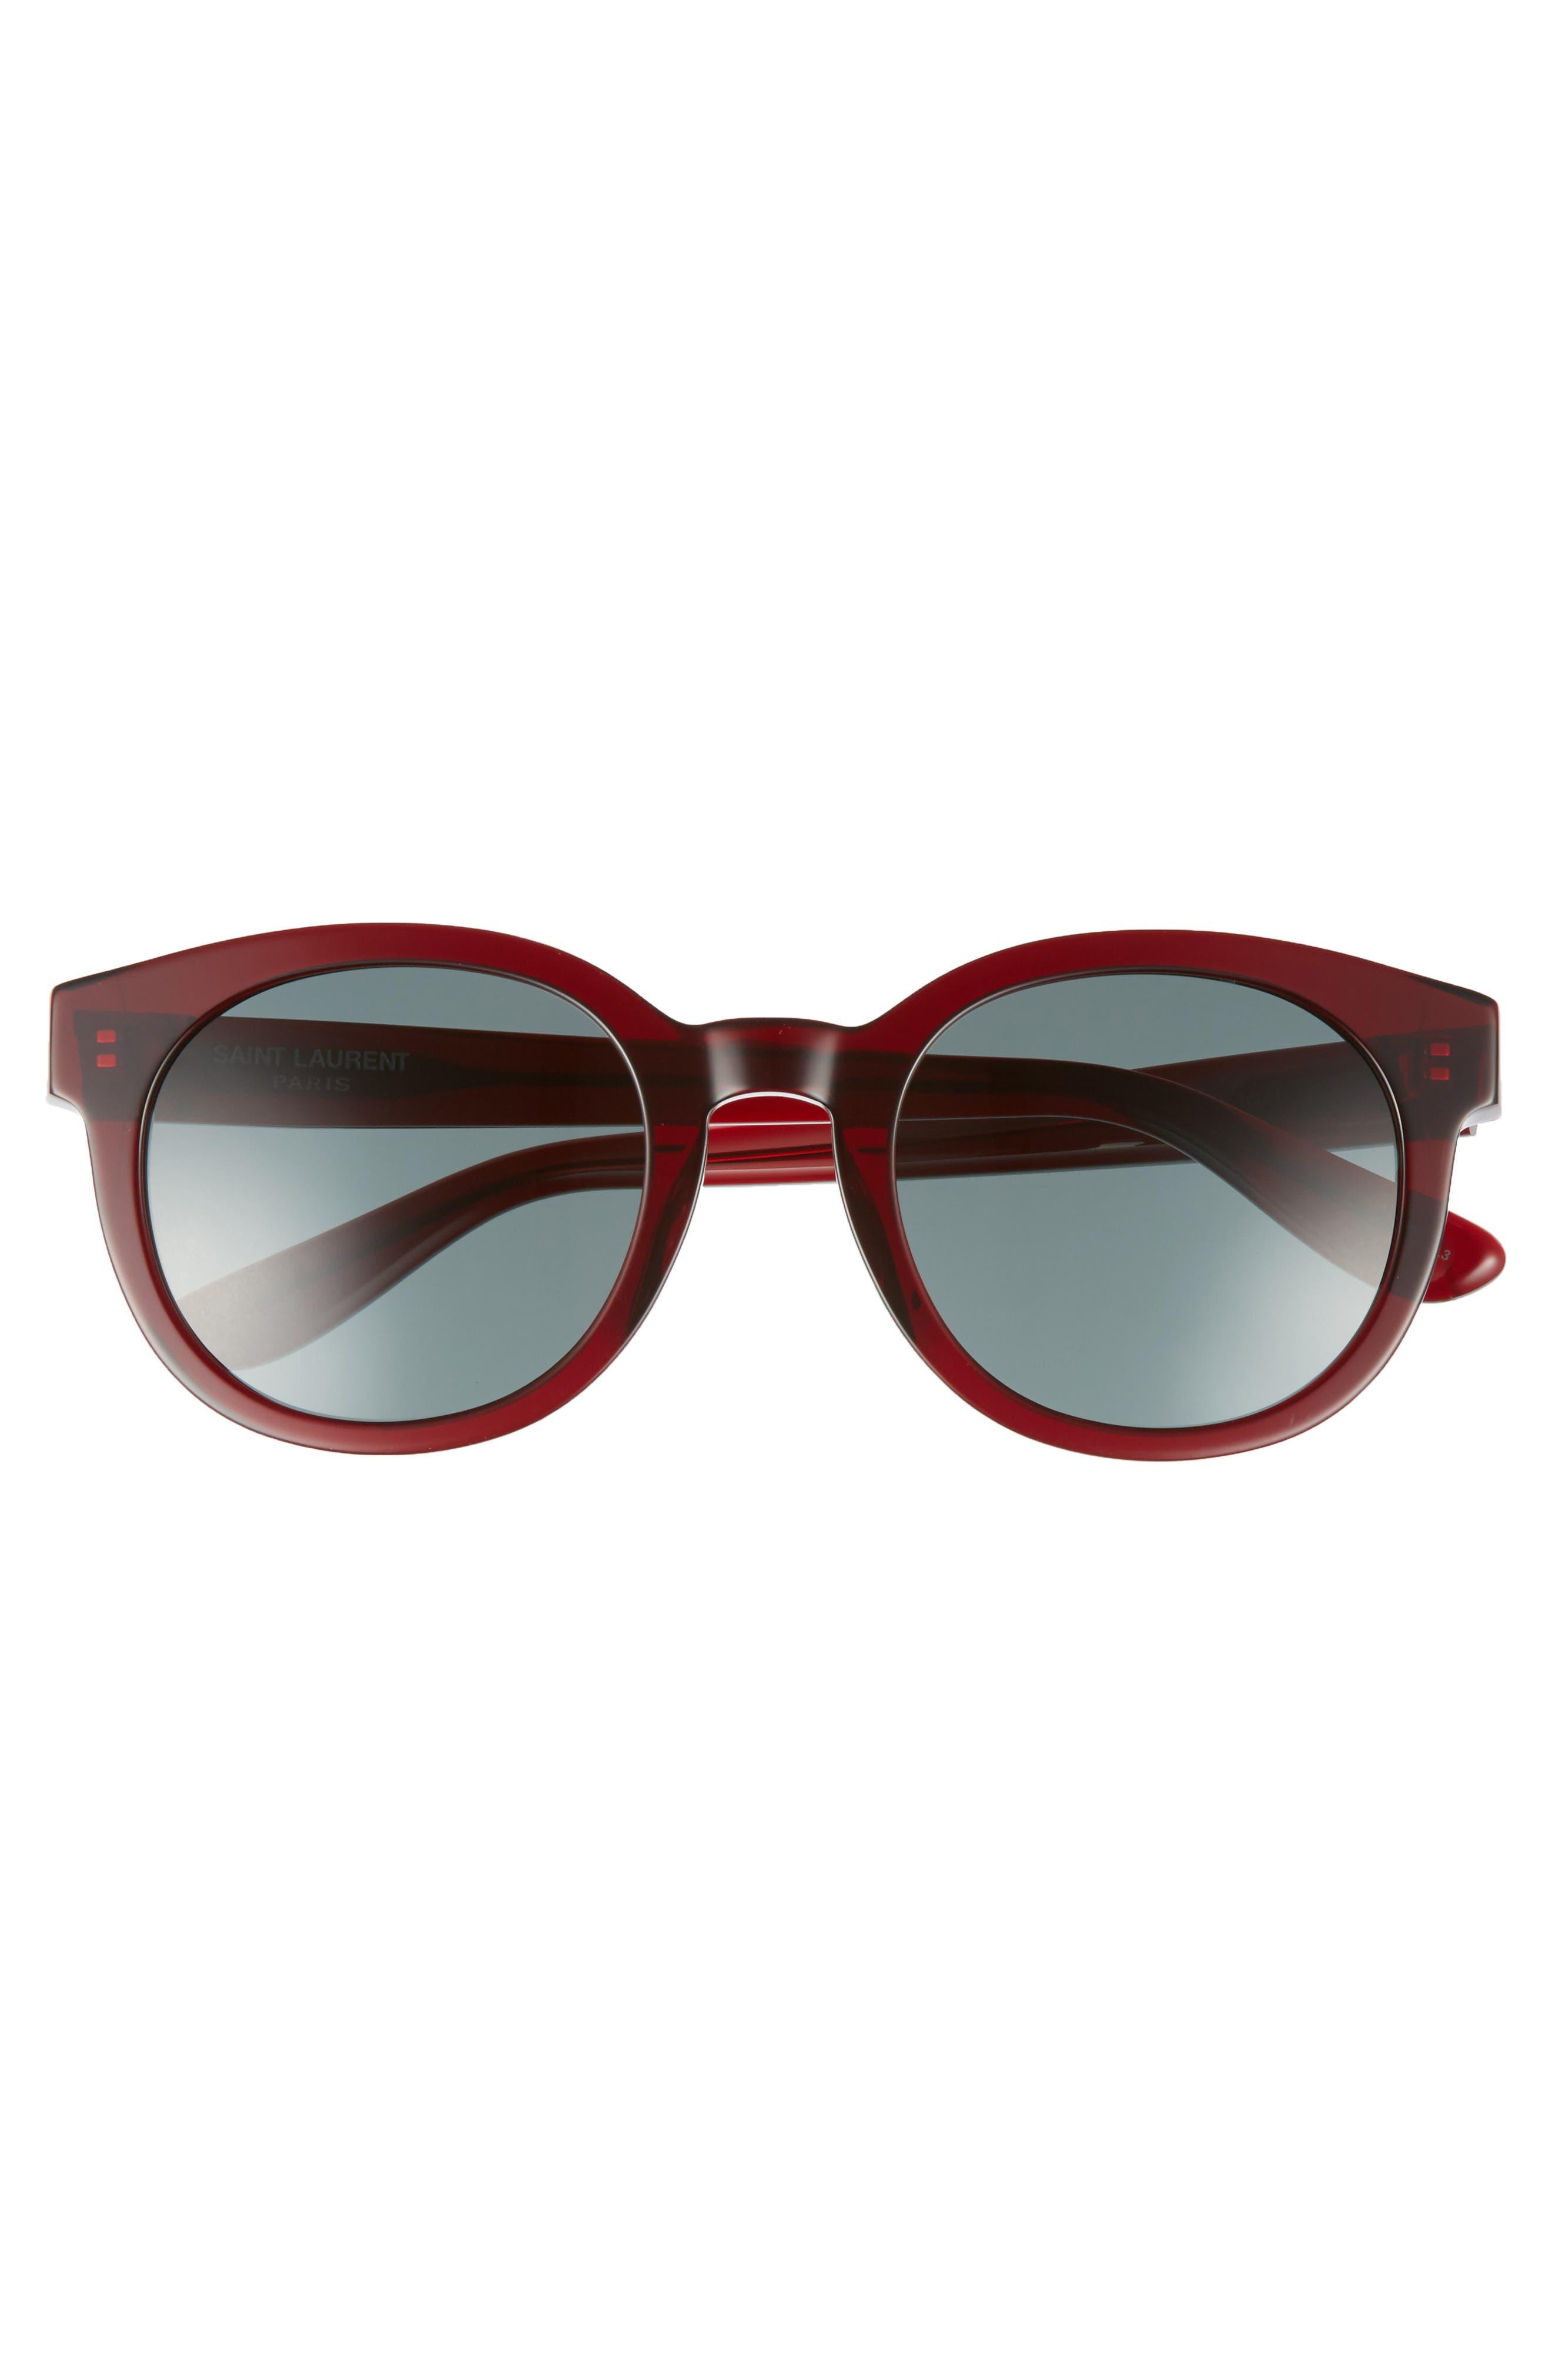 51mm Round Sunglasses,                             Alternate thumbnail 3, color,                             600